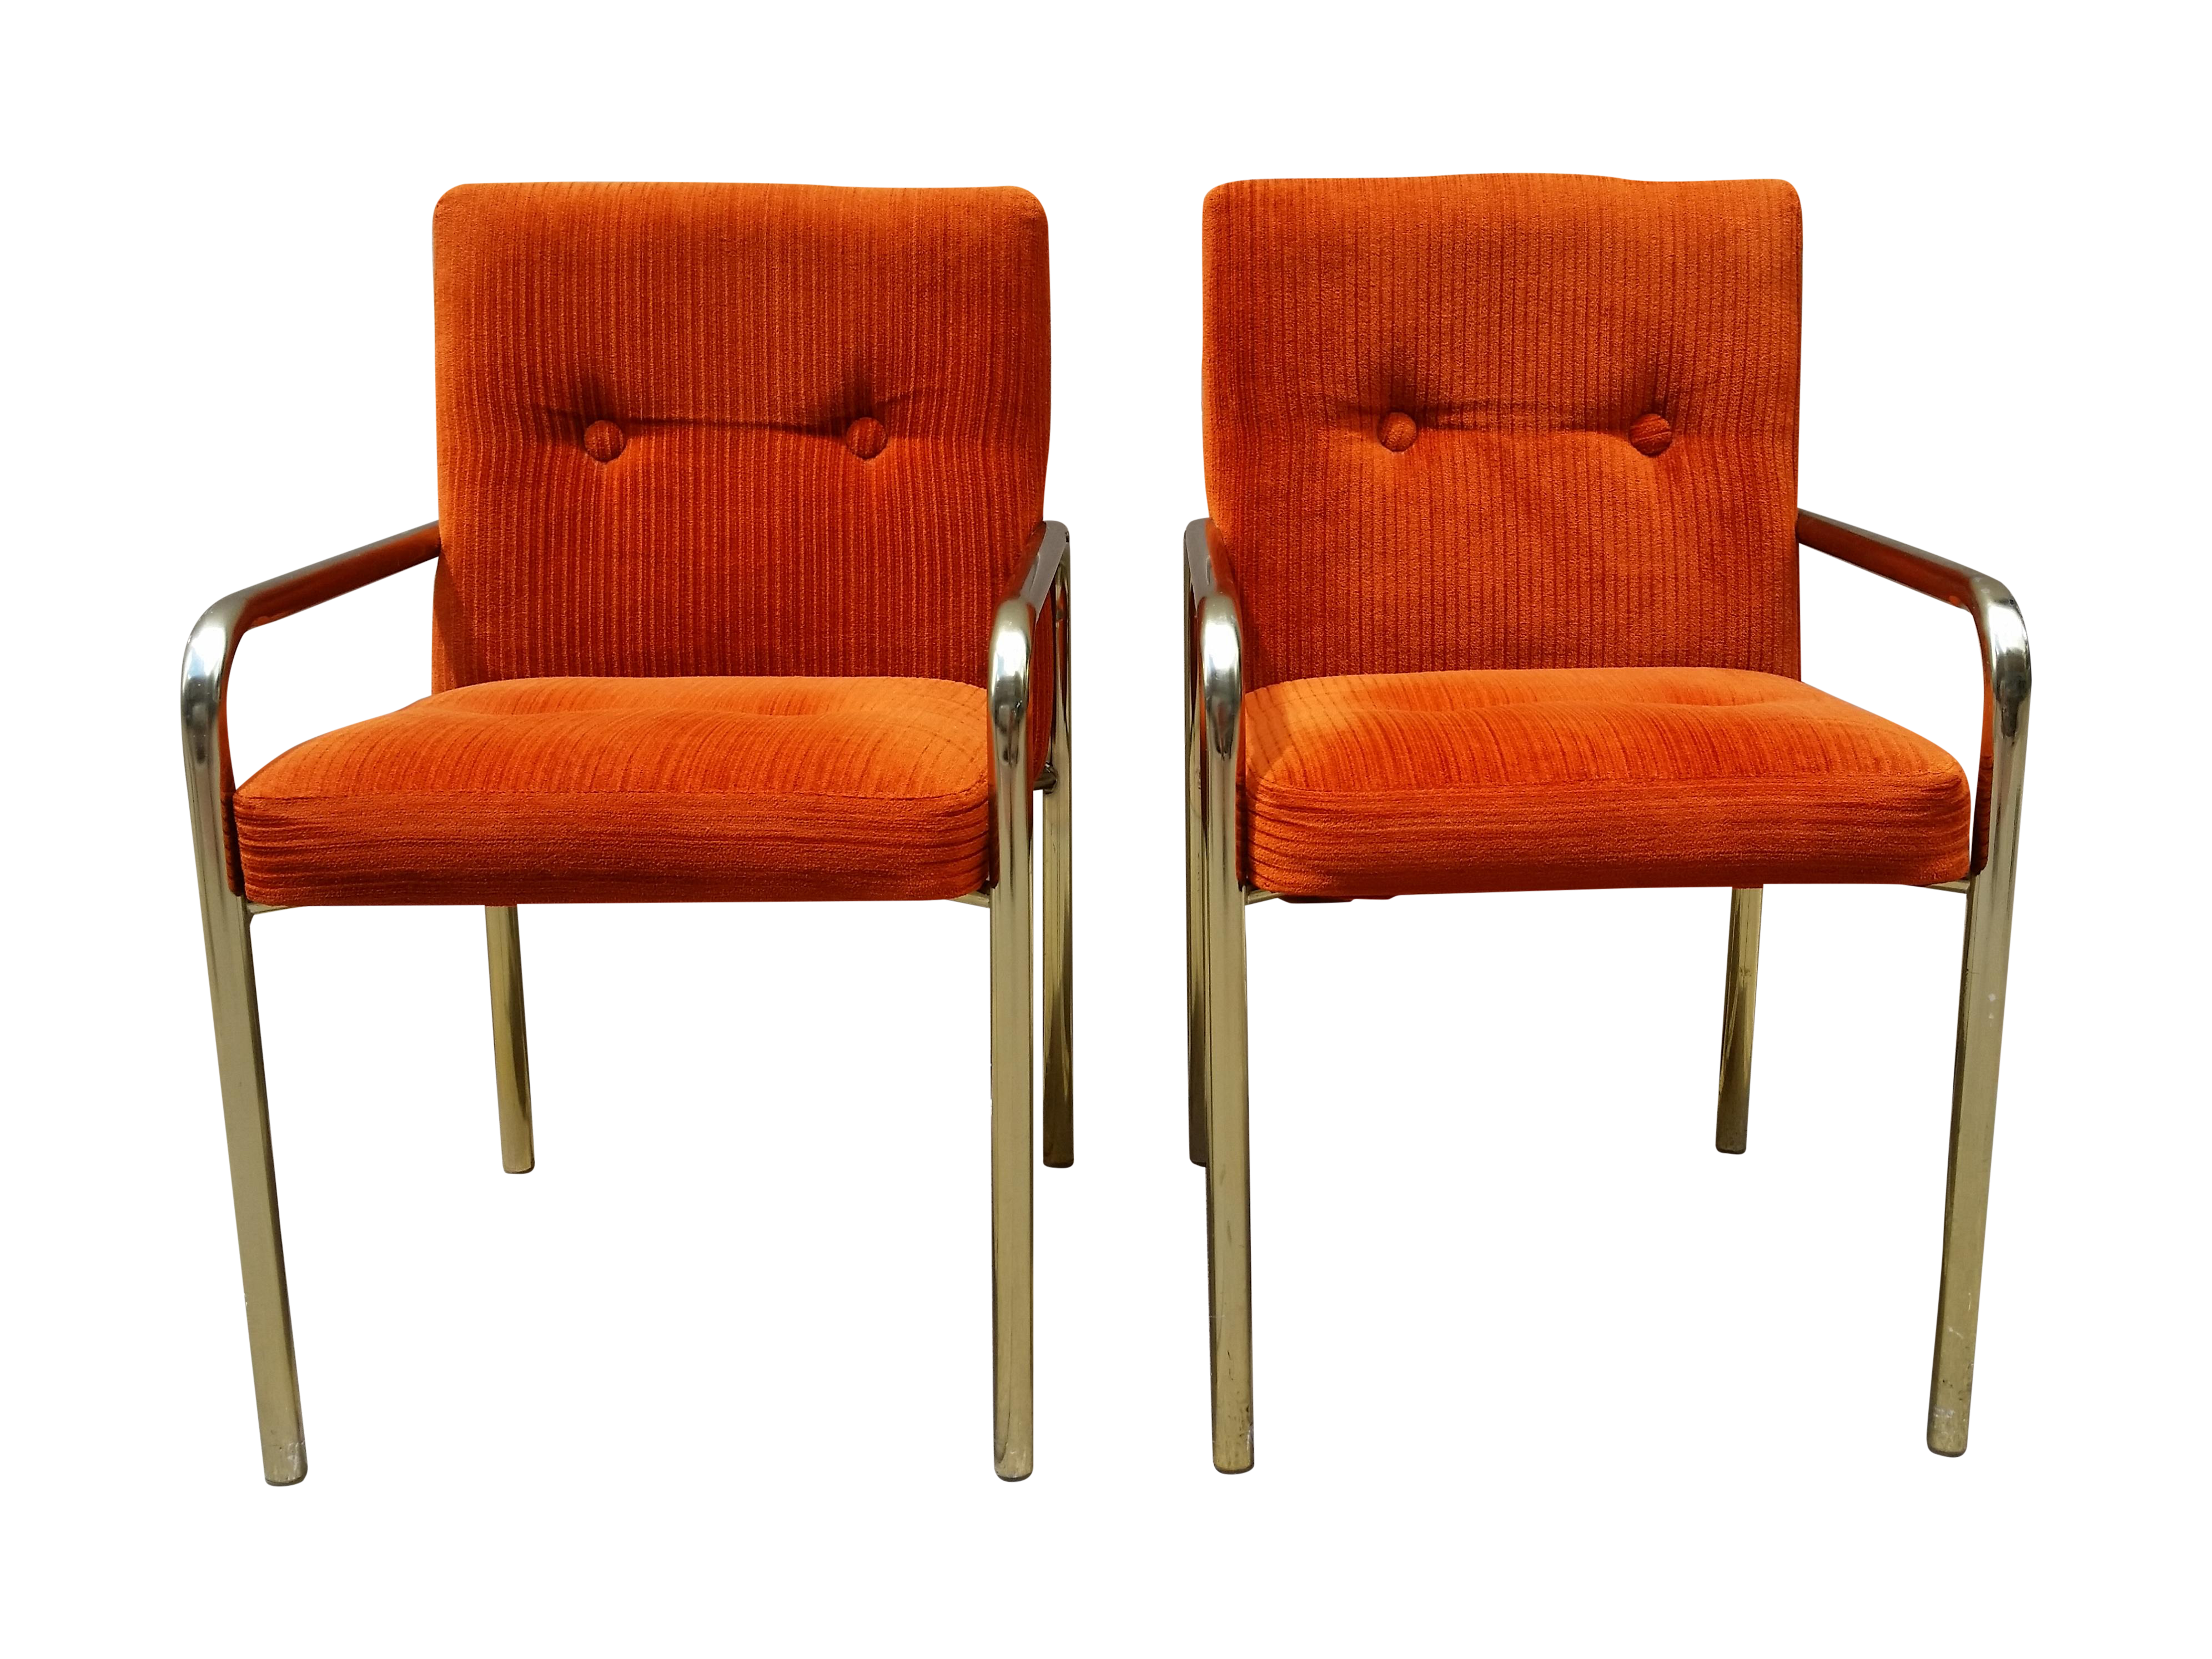 1980 Daystrom Orange Reception Chairs   A Pair